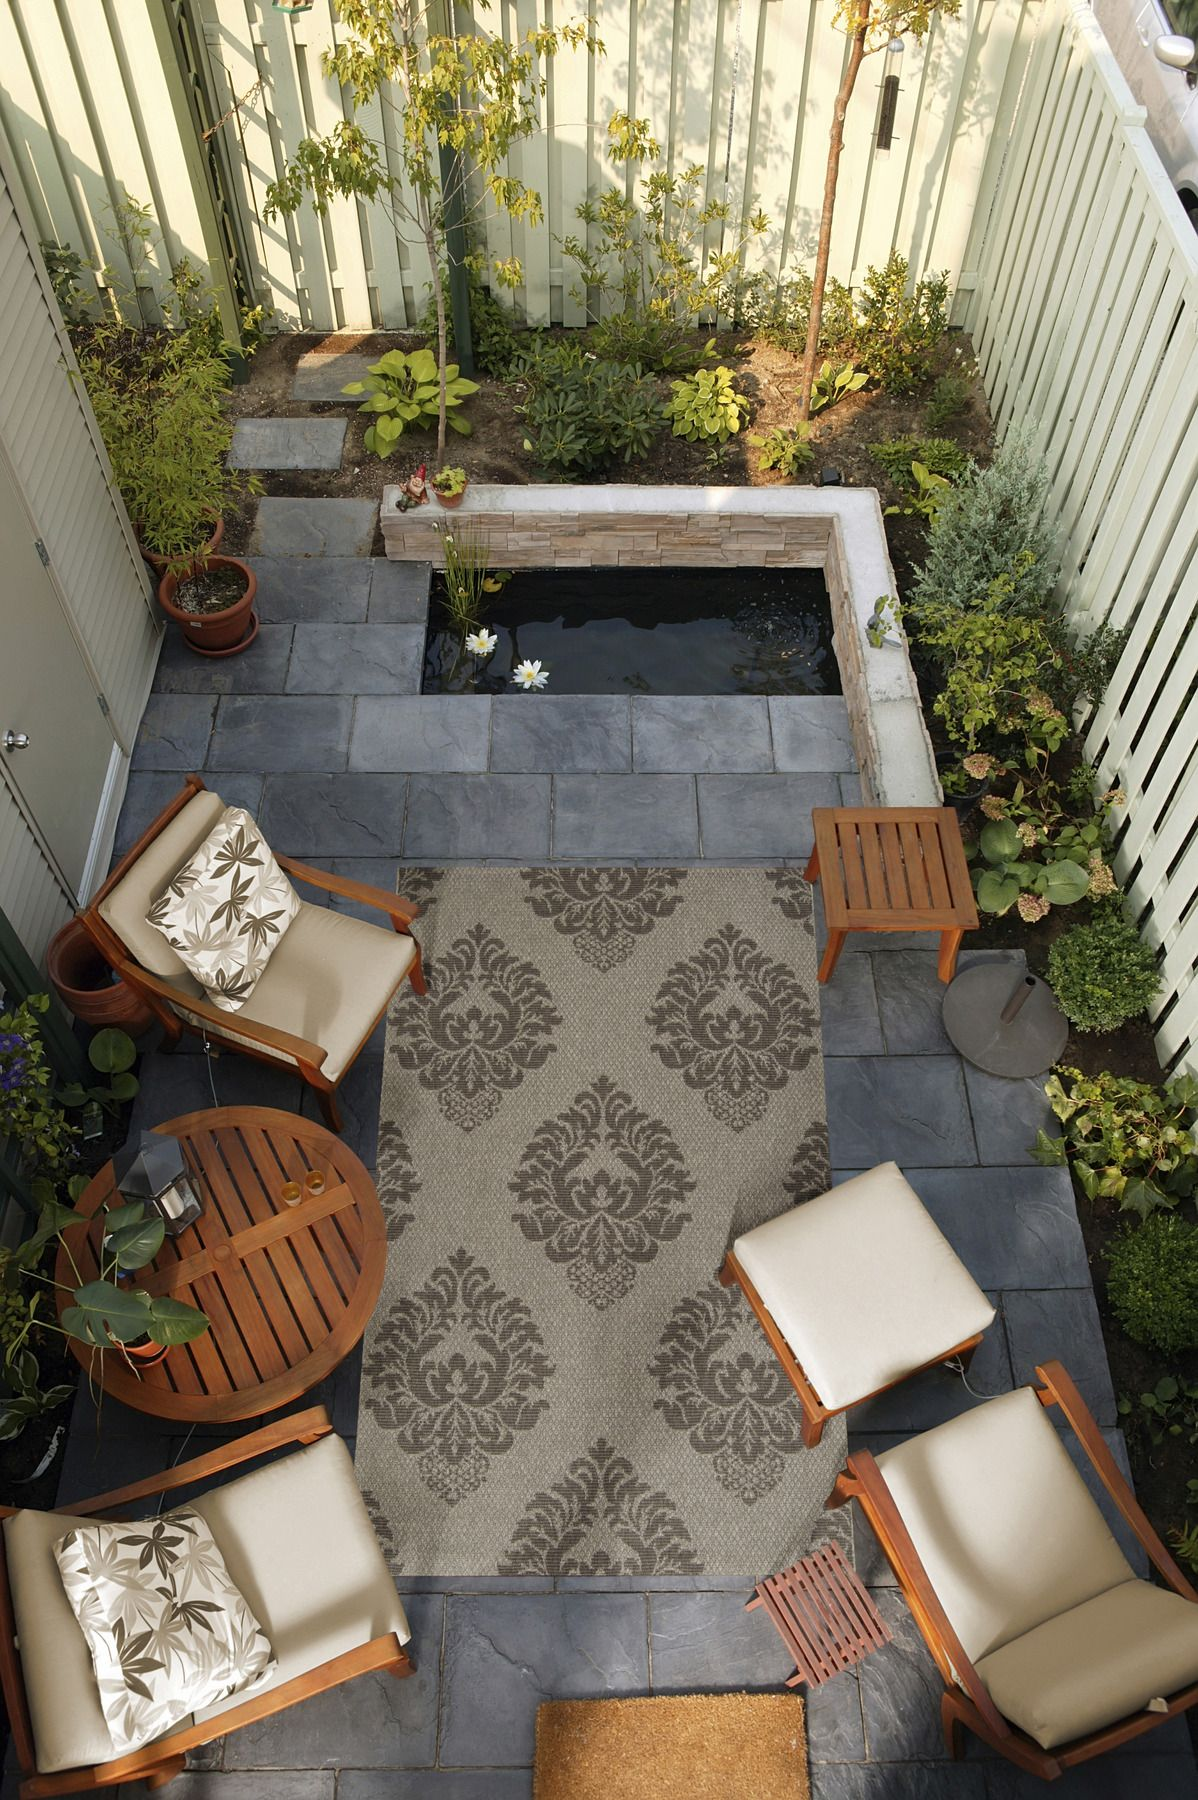 Backyard Space Ideas small outdoor space backyard, ideas, garden, diy, bbq, hammock